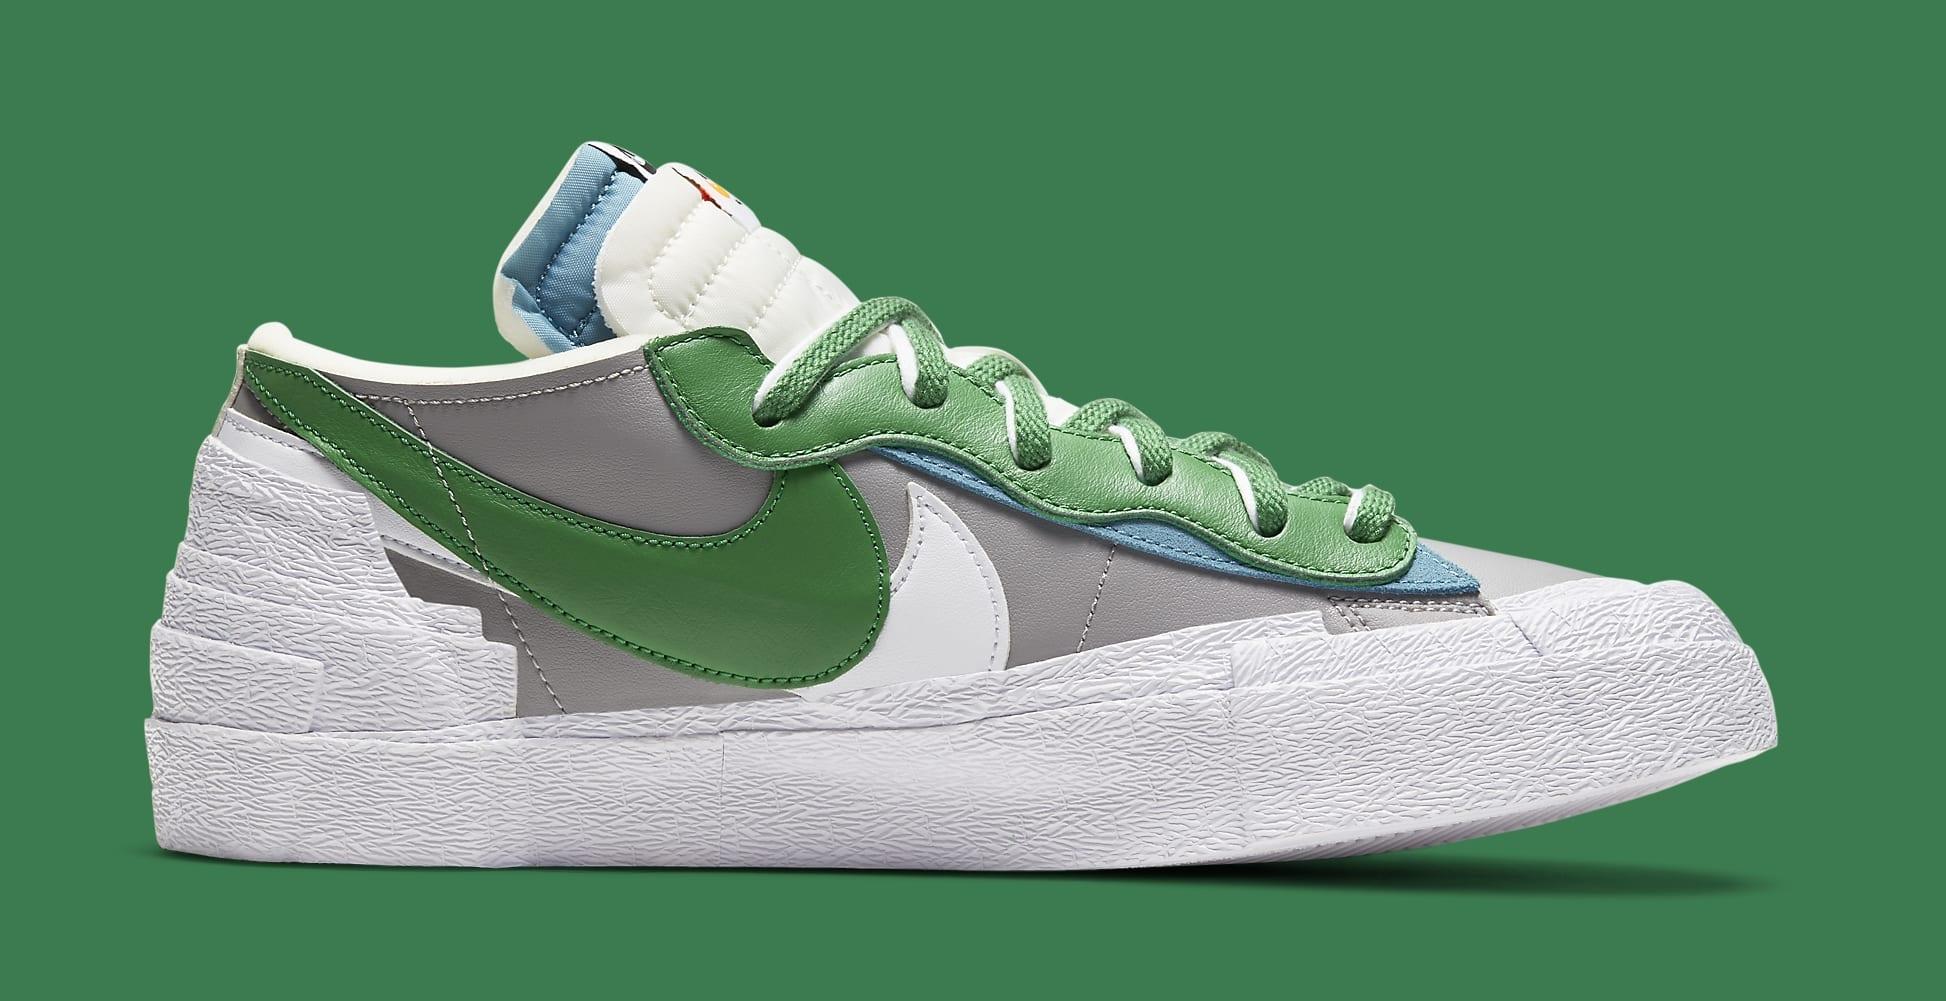 Sacai x Nike Blazer Low 'Classic Green' DD1877-001 Medial